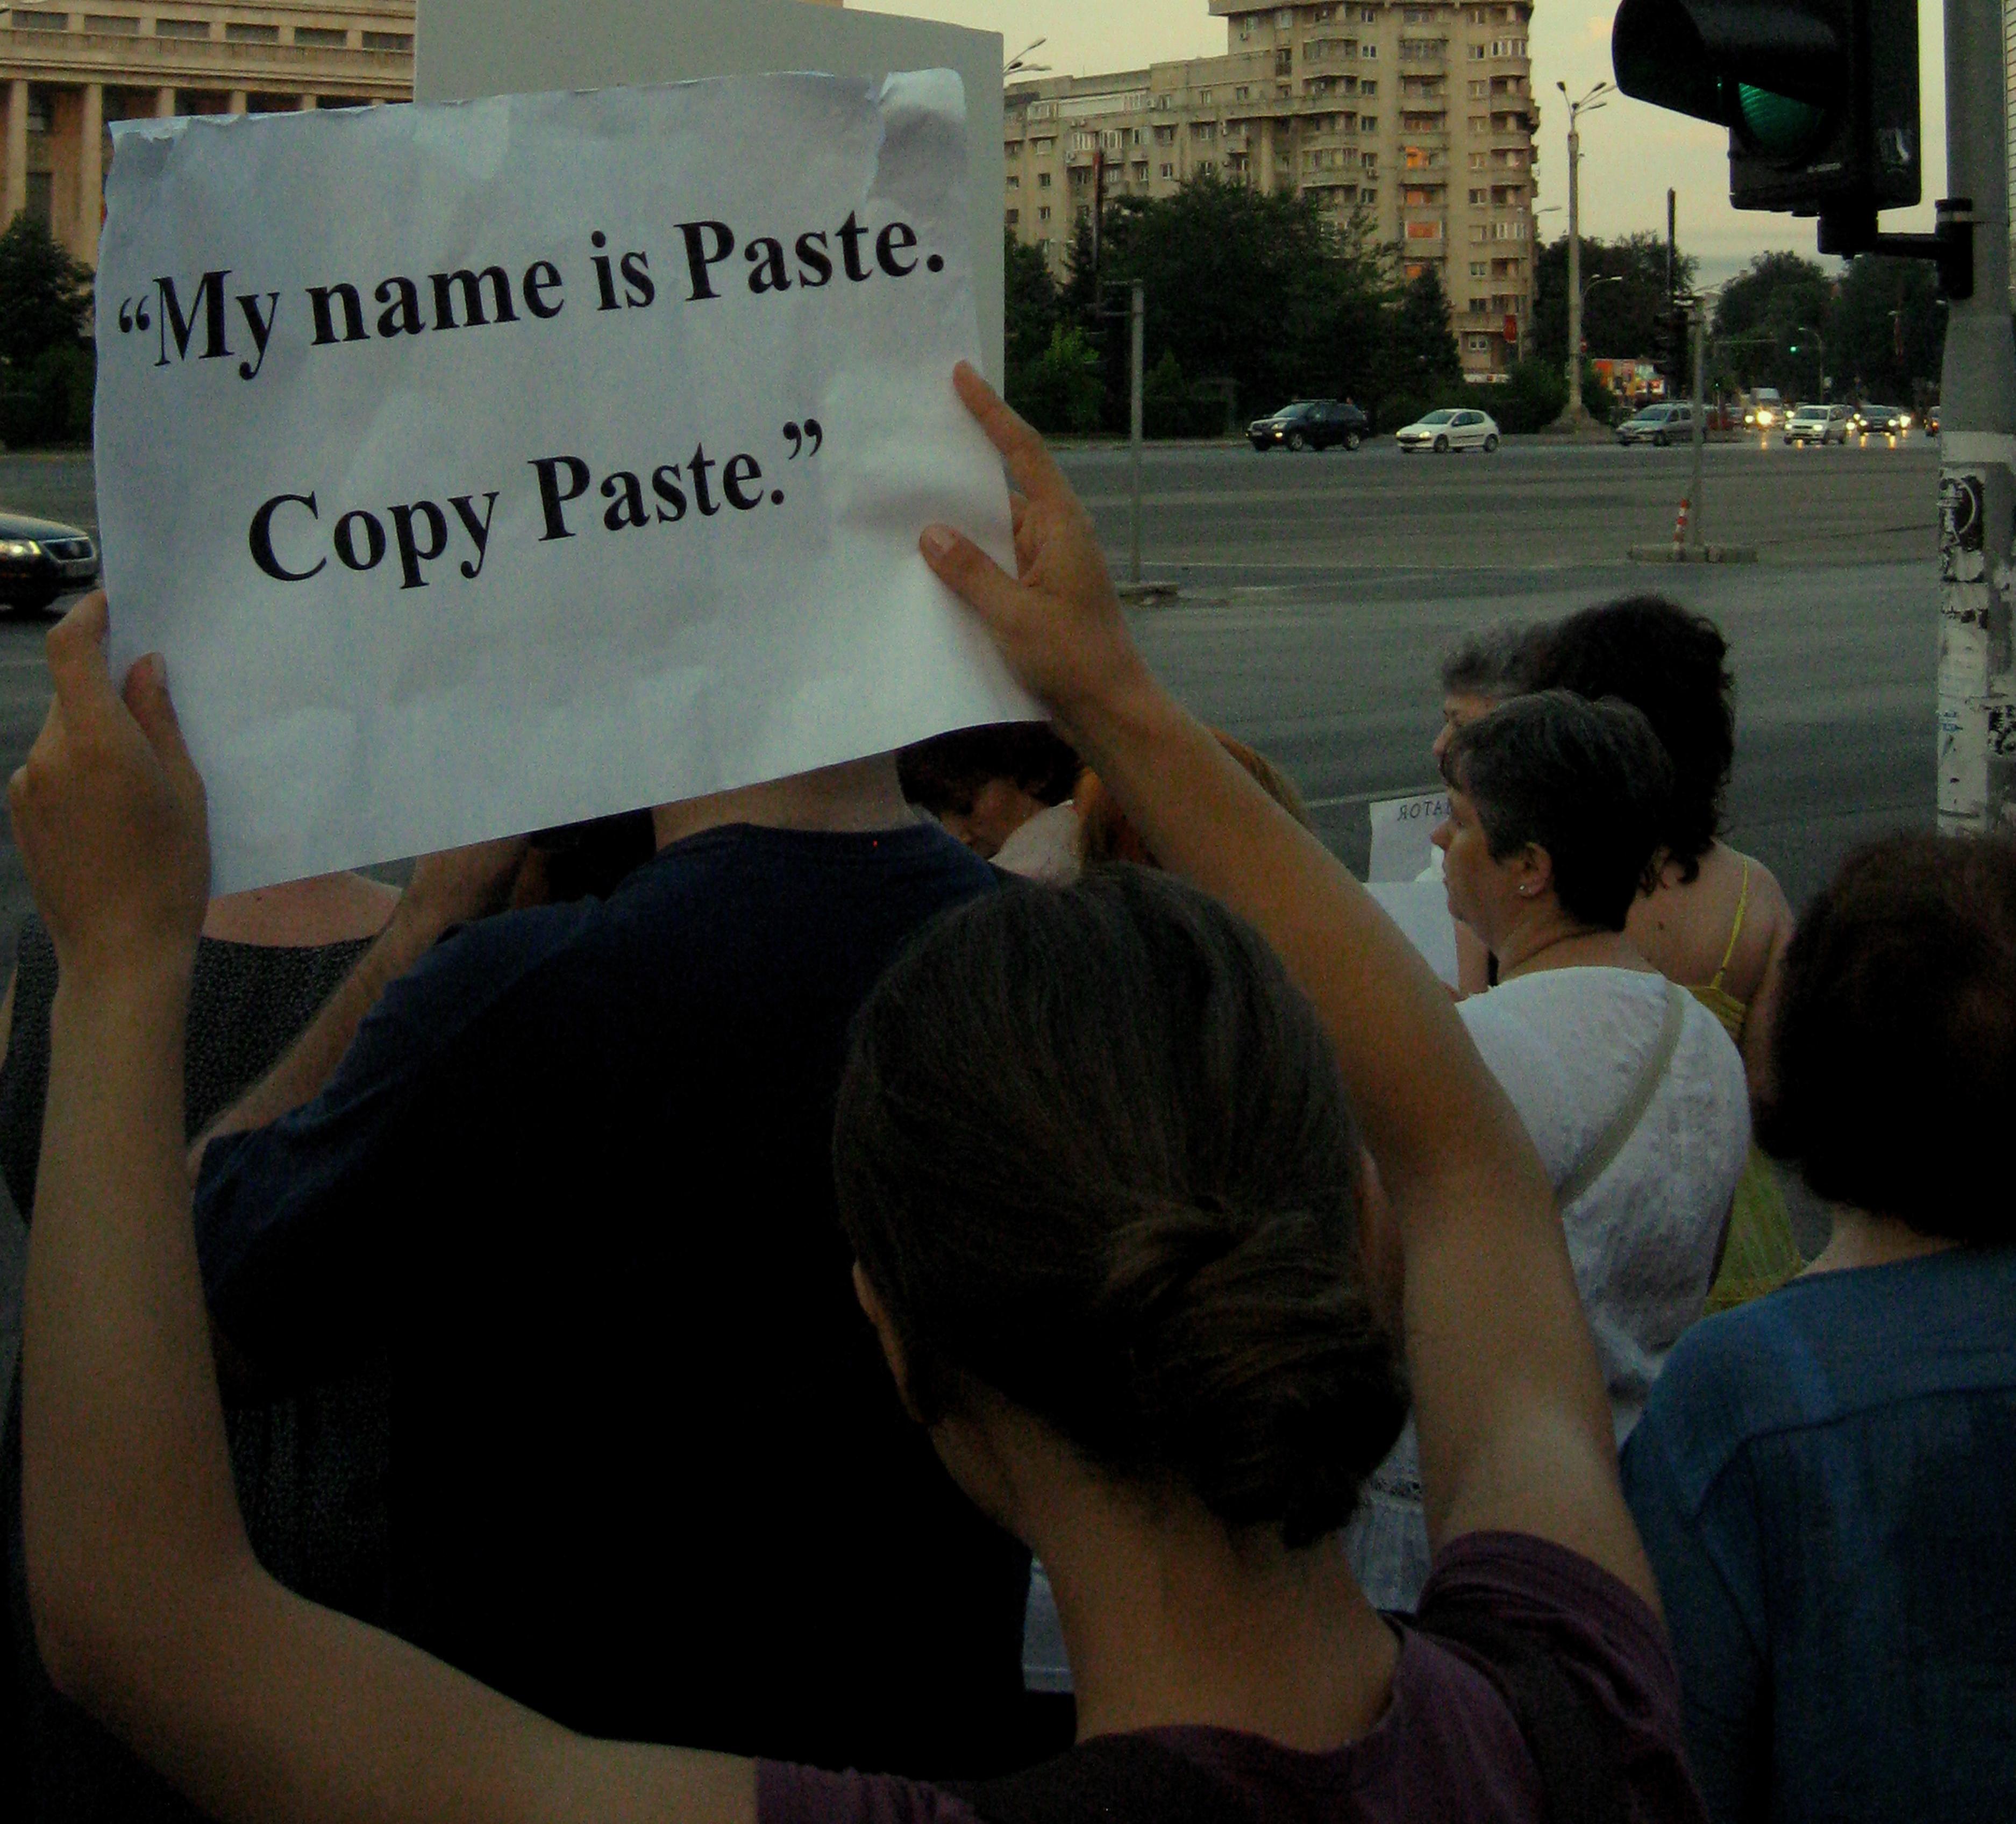 File:My name is Paste. Copy Paste, proteste Victoria 9-7-12.JPG